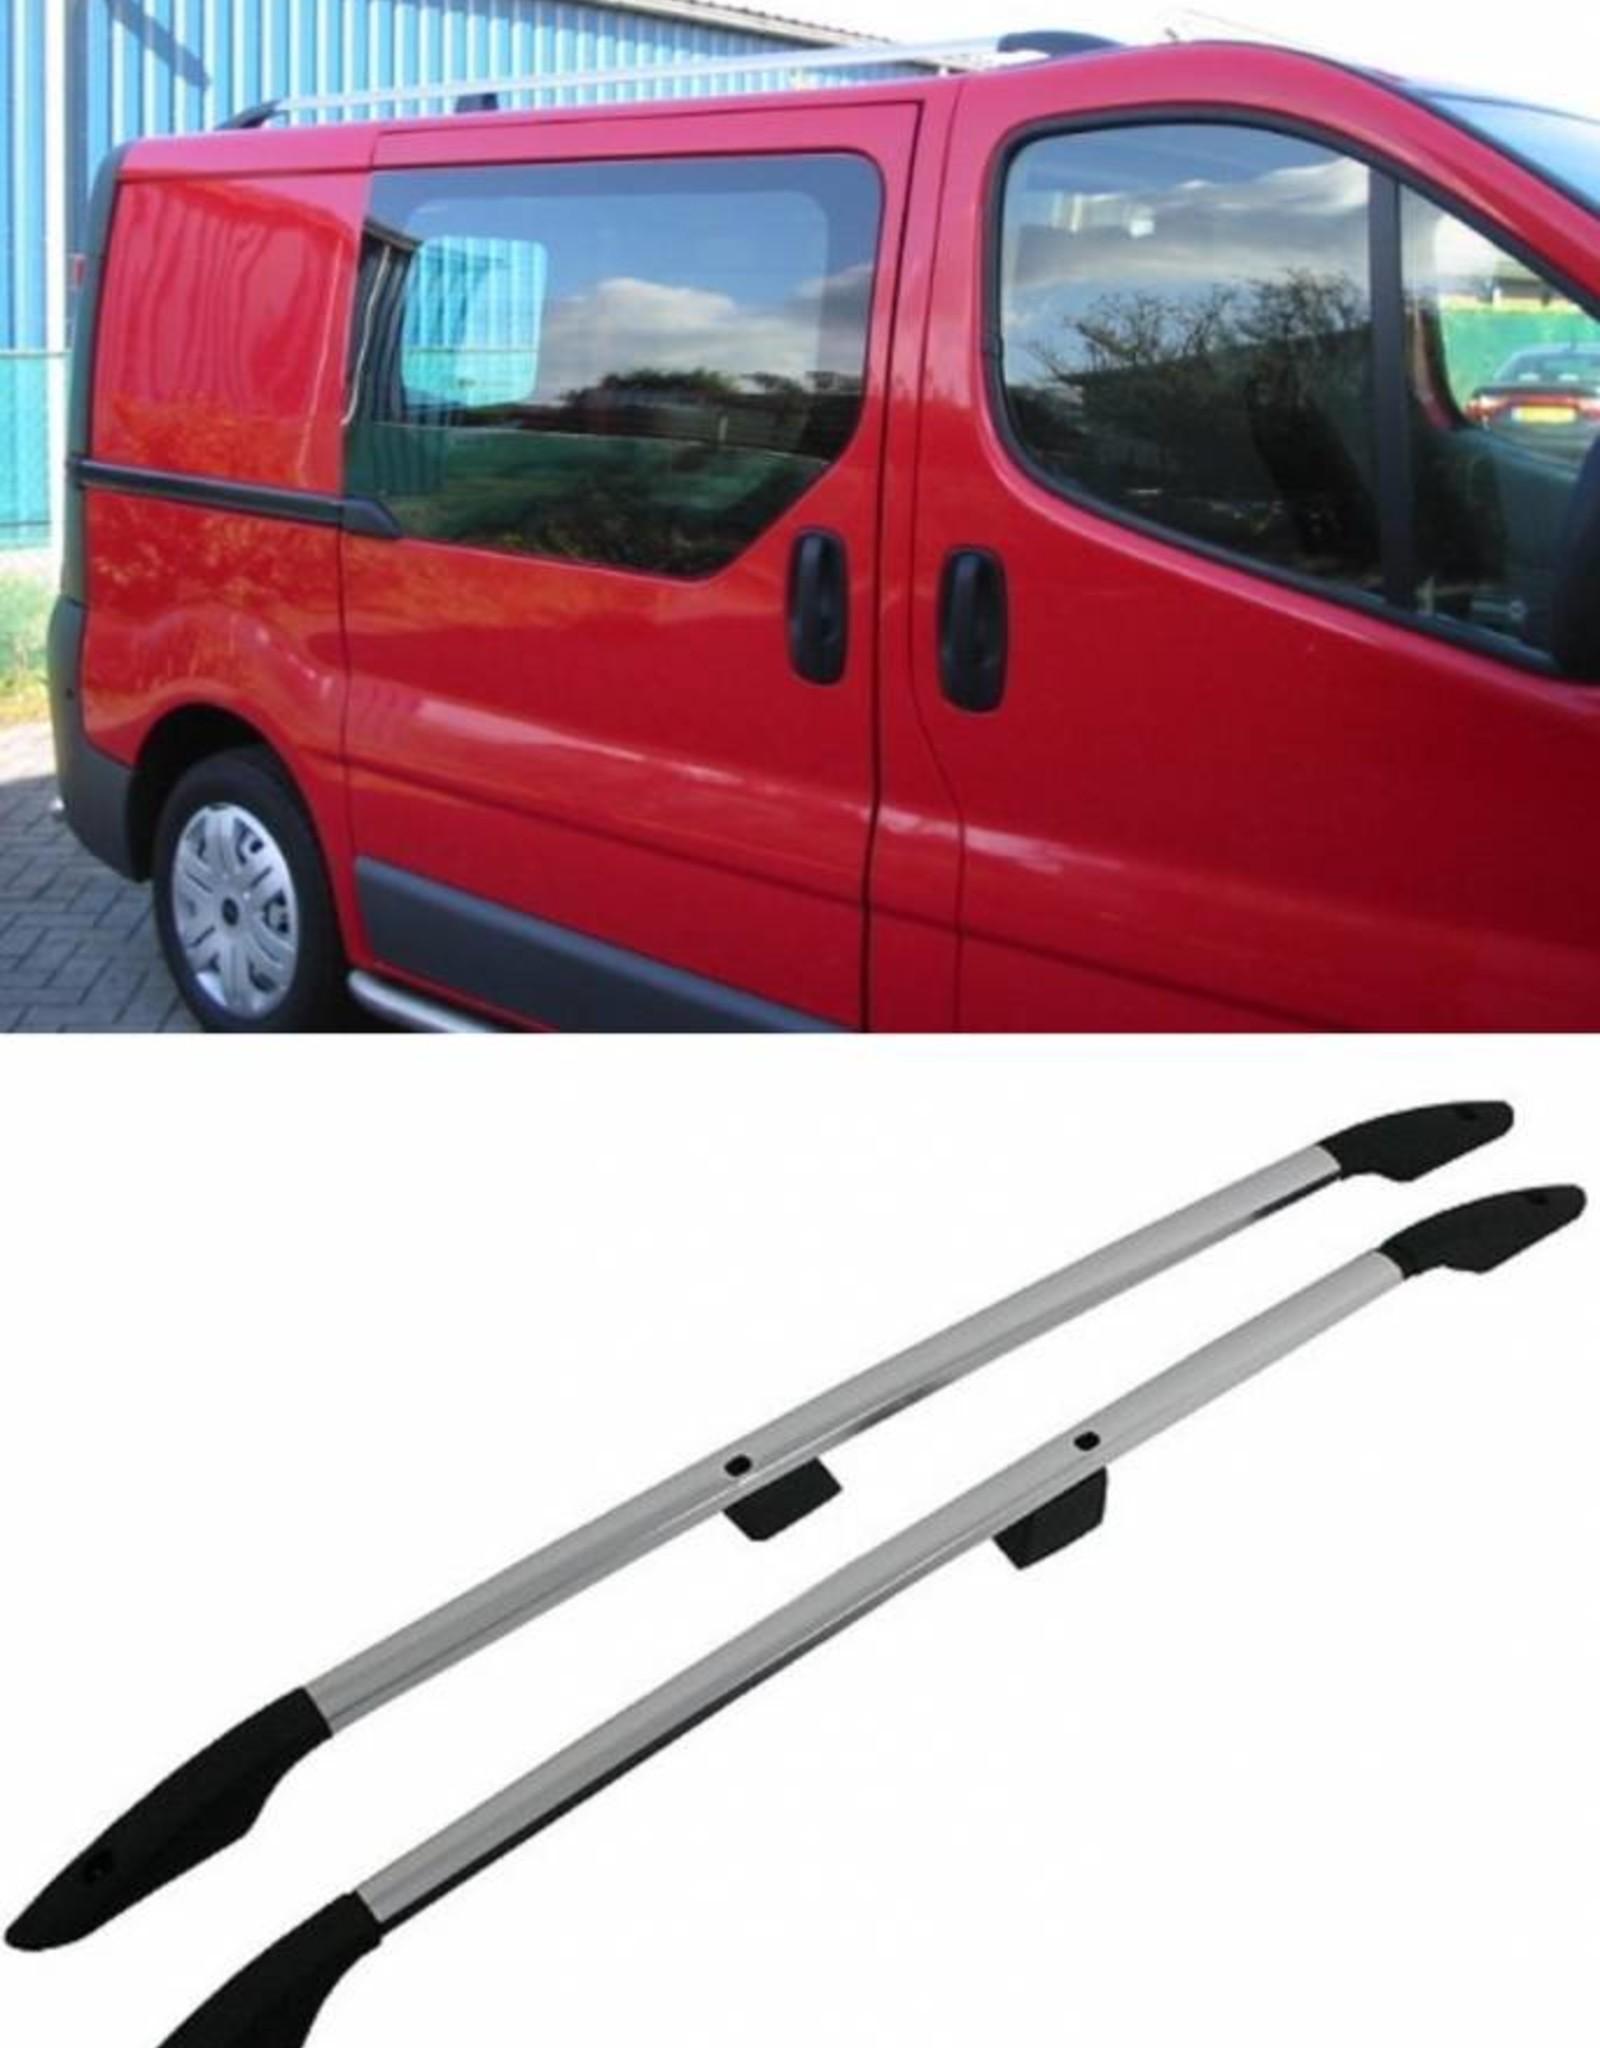 Dakrails aluminium voor Opel Vivaro, Renault Trafic lange wielbasis